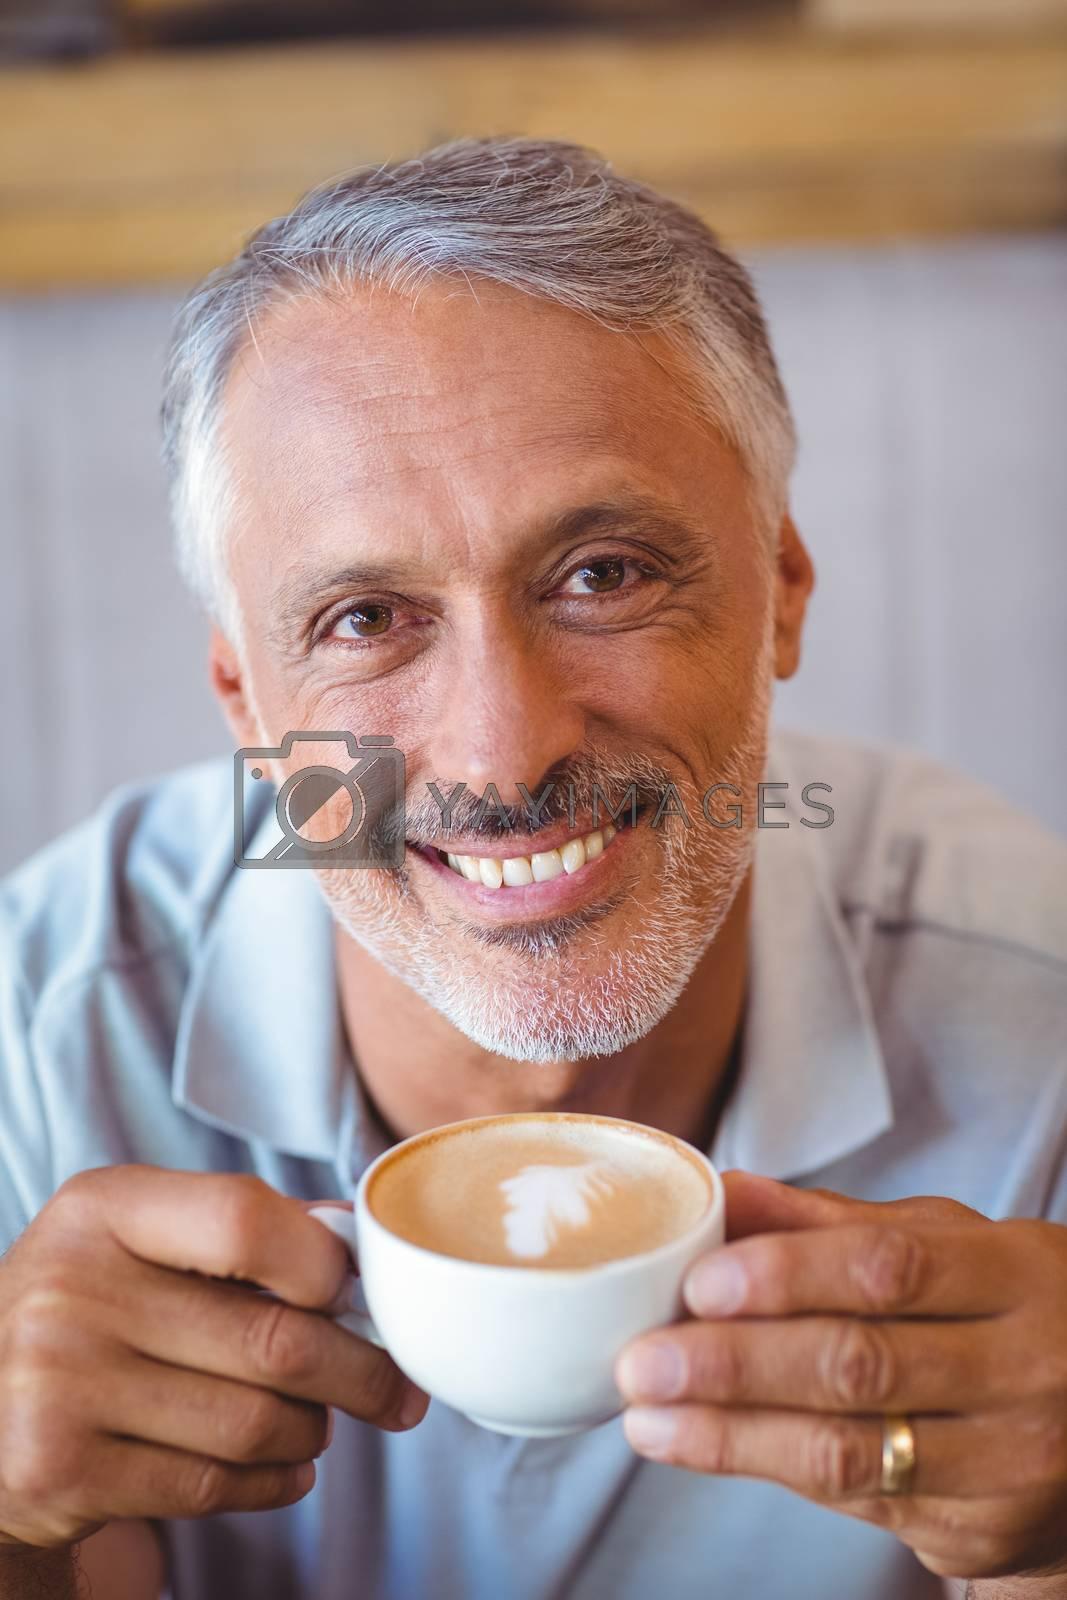 Royalty free image of Man sitting in cafe having coffee by Wavebreakmedia